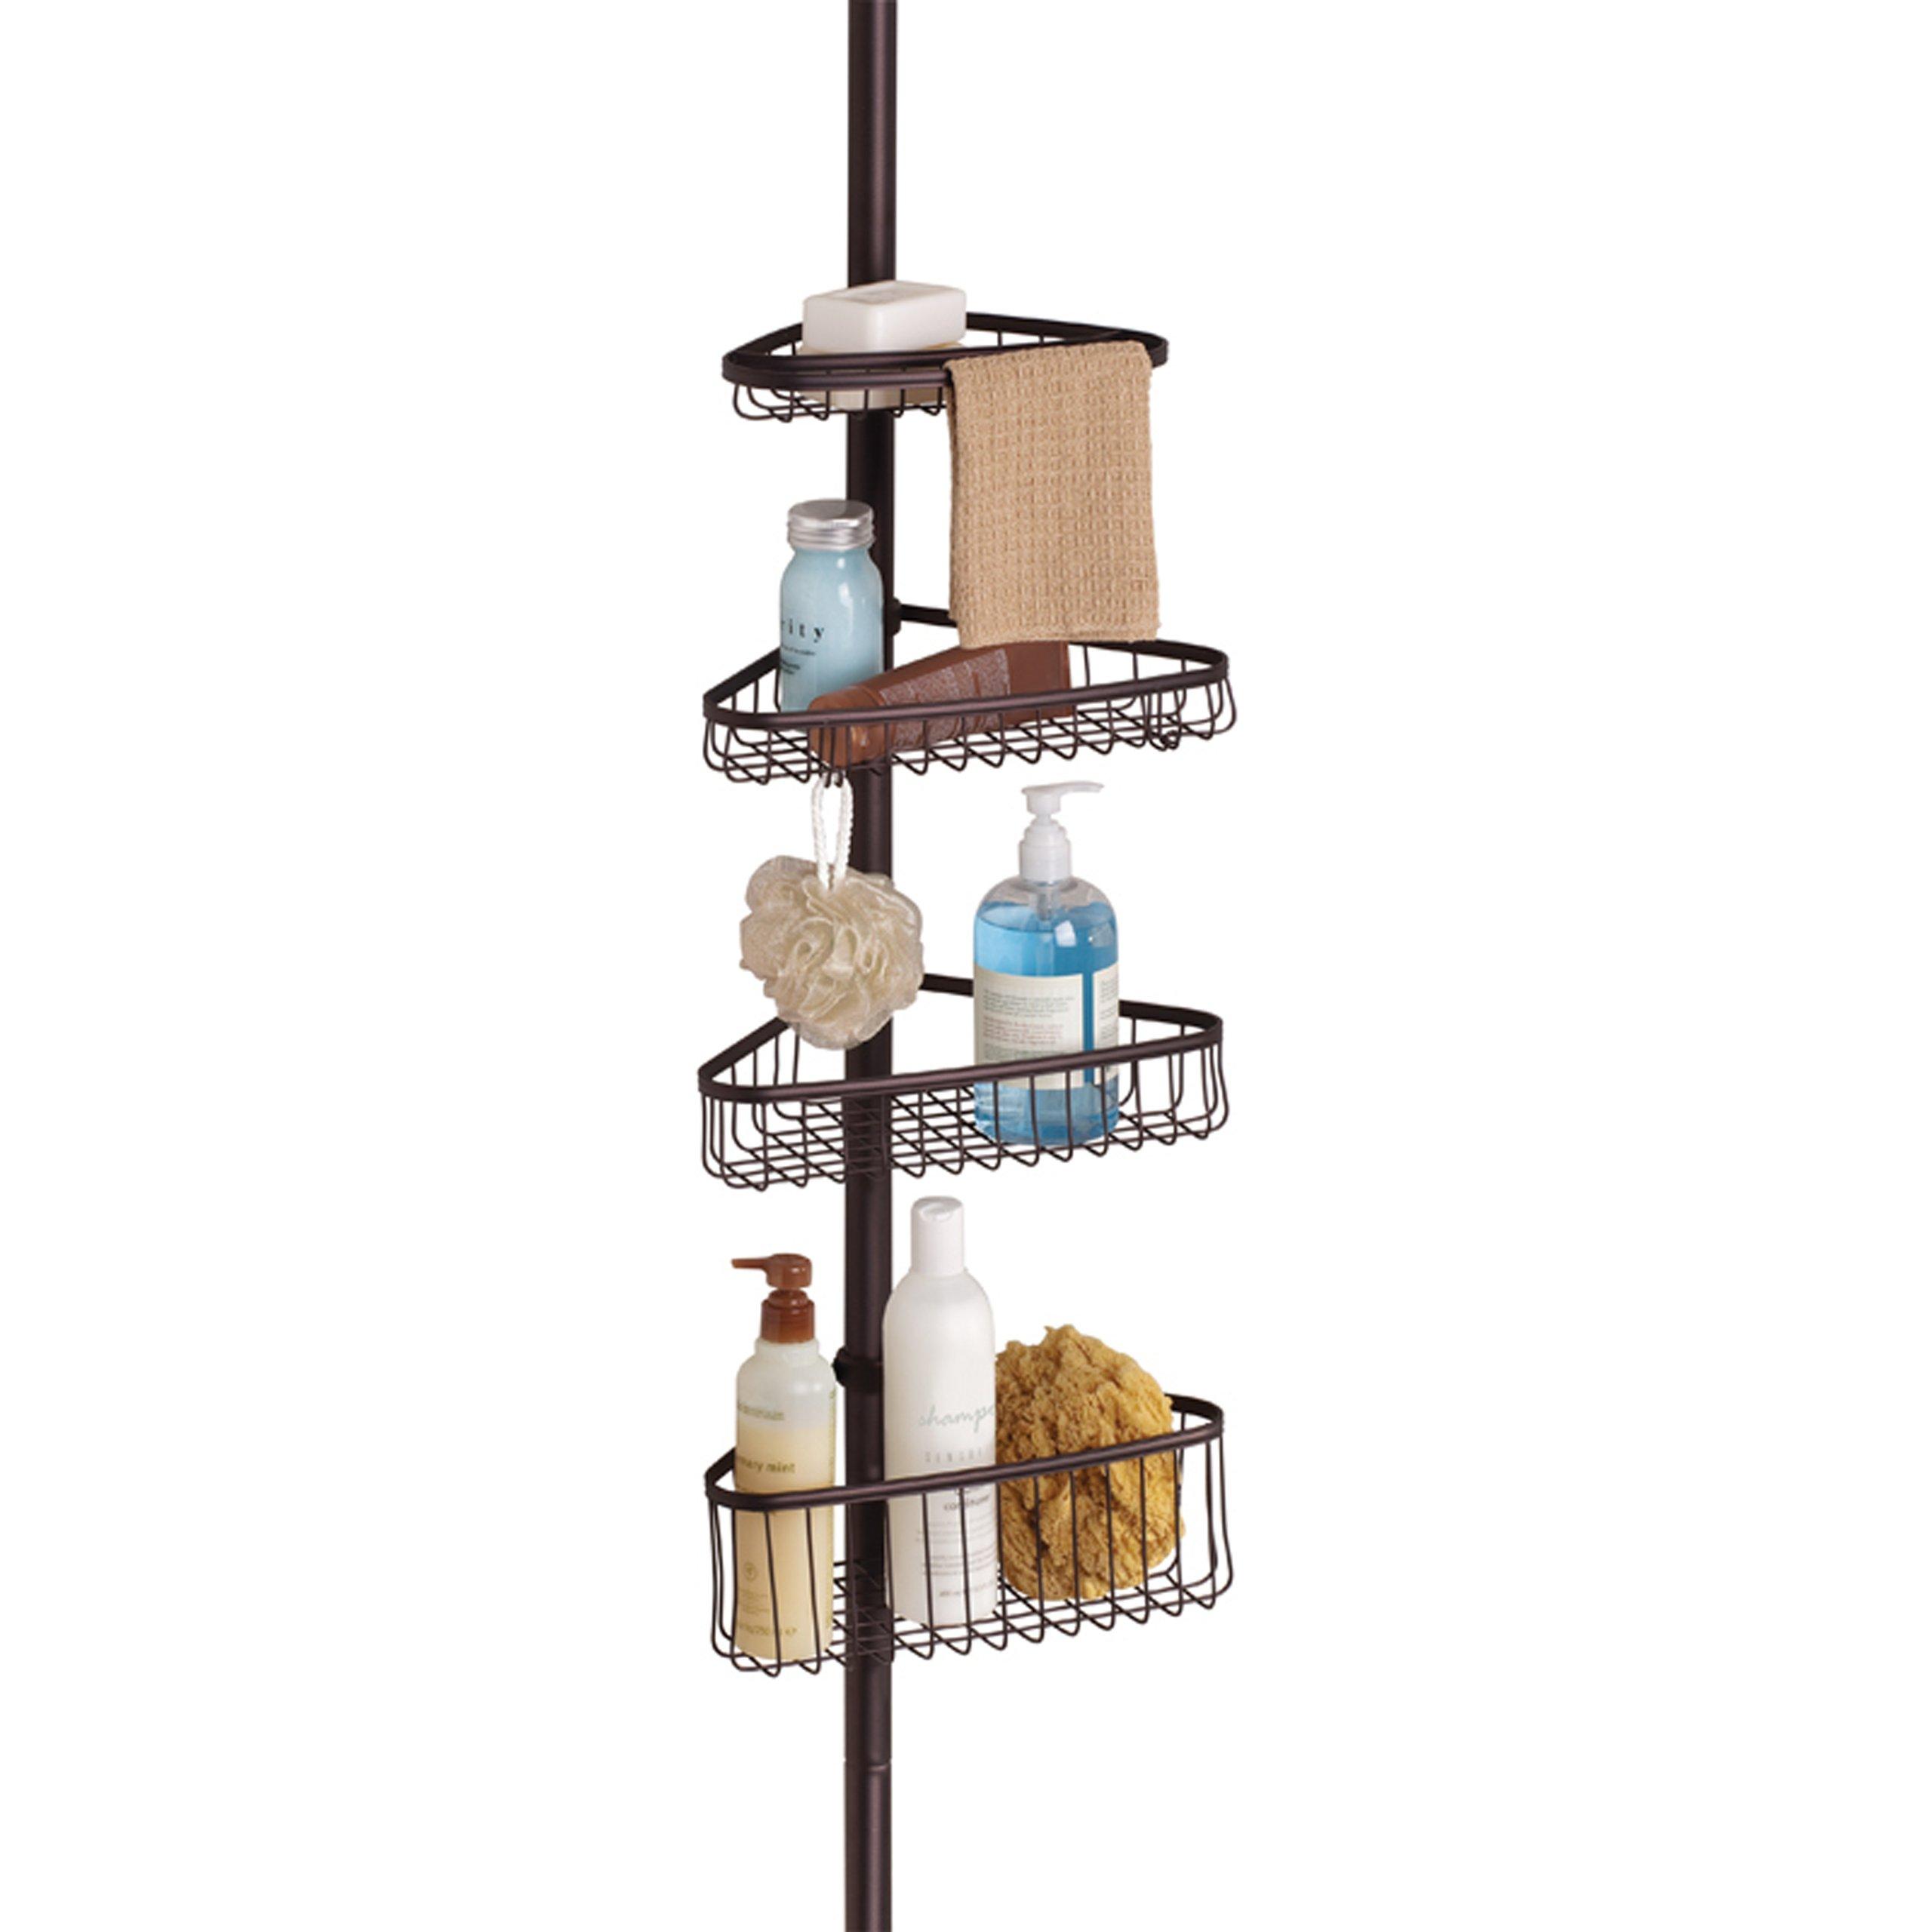 InterDesign York Constant Tension Corner Shower Caddy – Bathroom Storage Shelves for Shampoo, Conditioner, Soap and Razors, Bronze